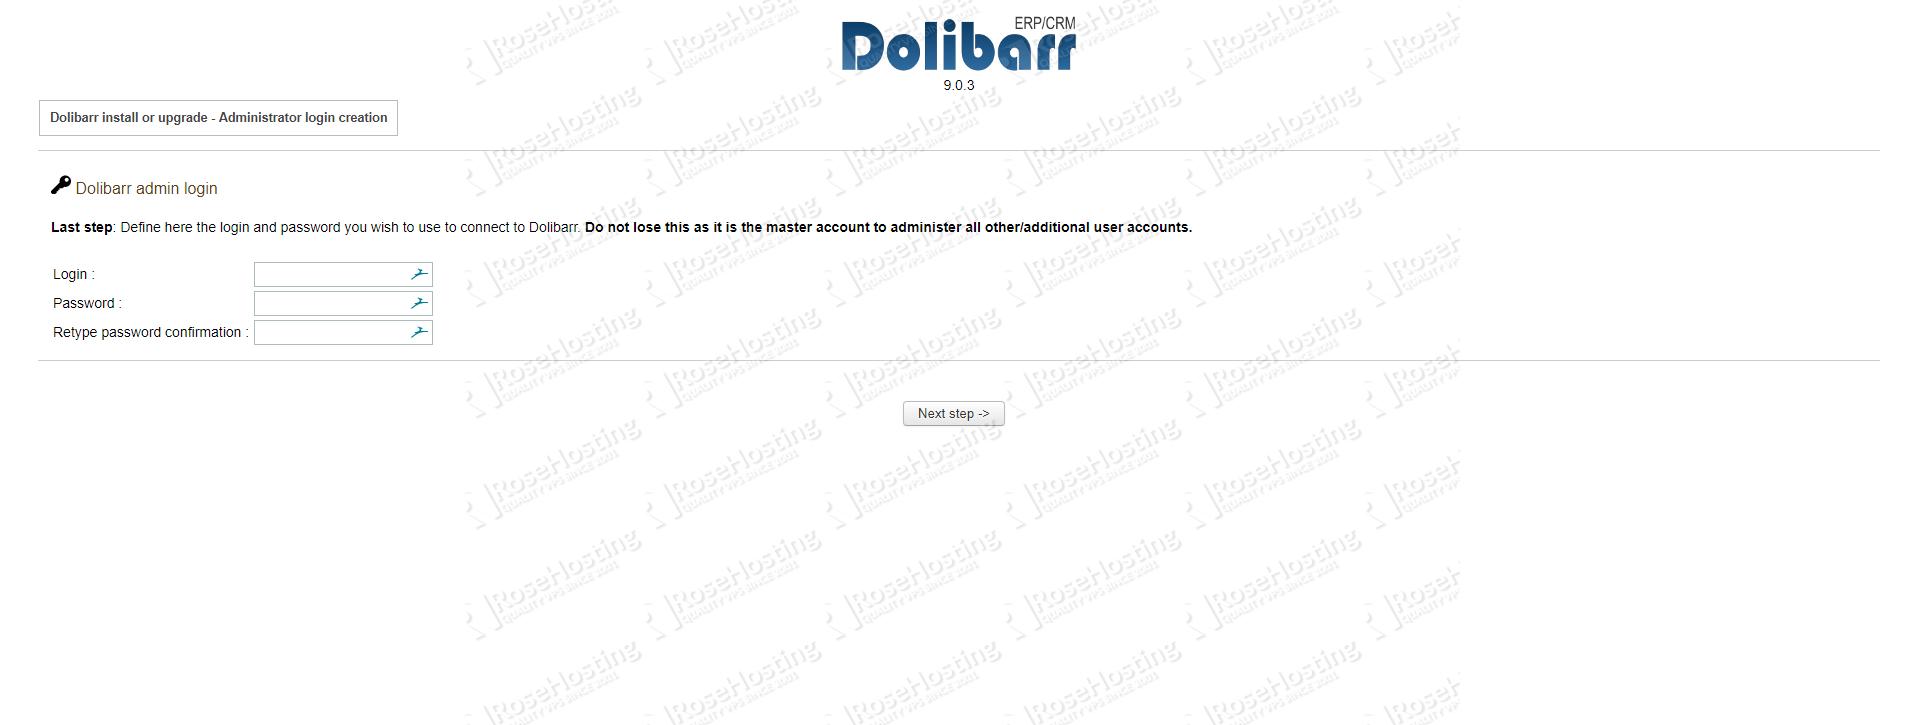 Dolibarr admin login